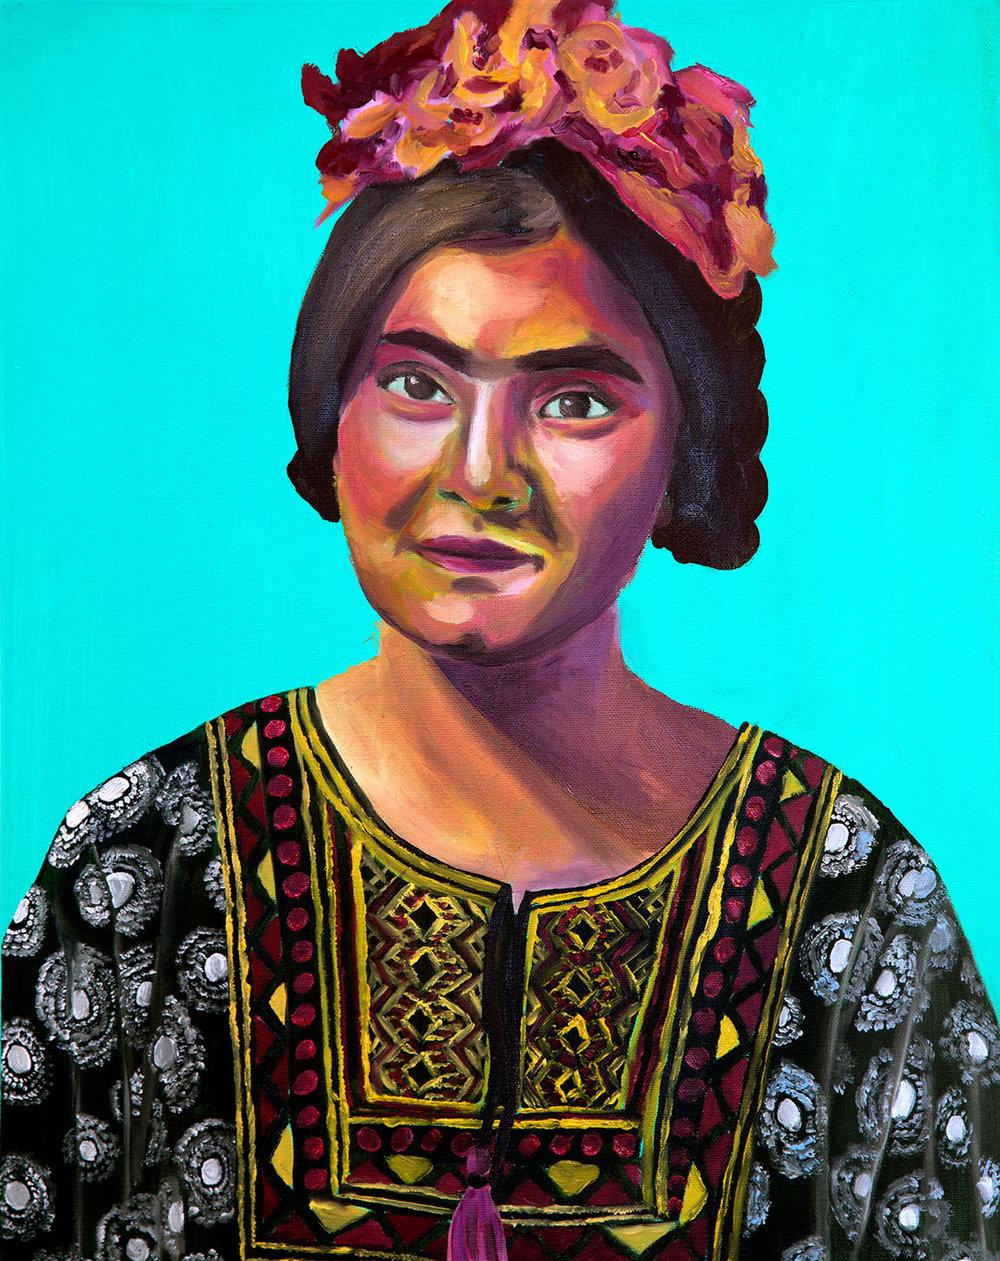 Far Too Frida - Oil on canvas20 x 16 inches2018